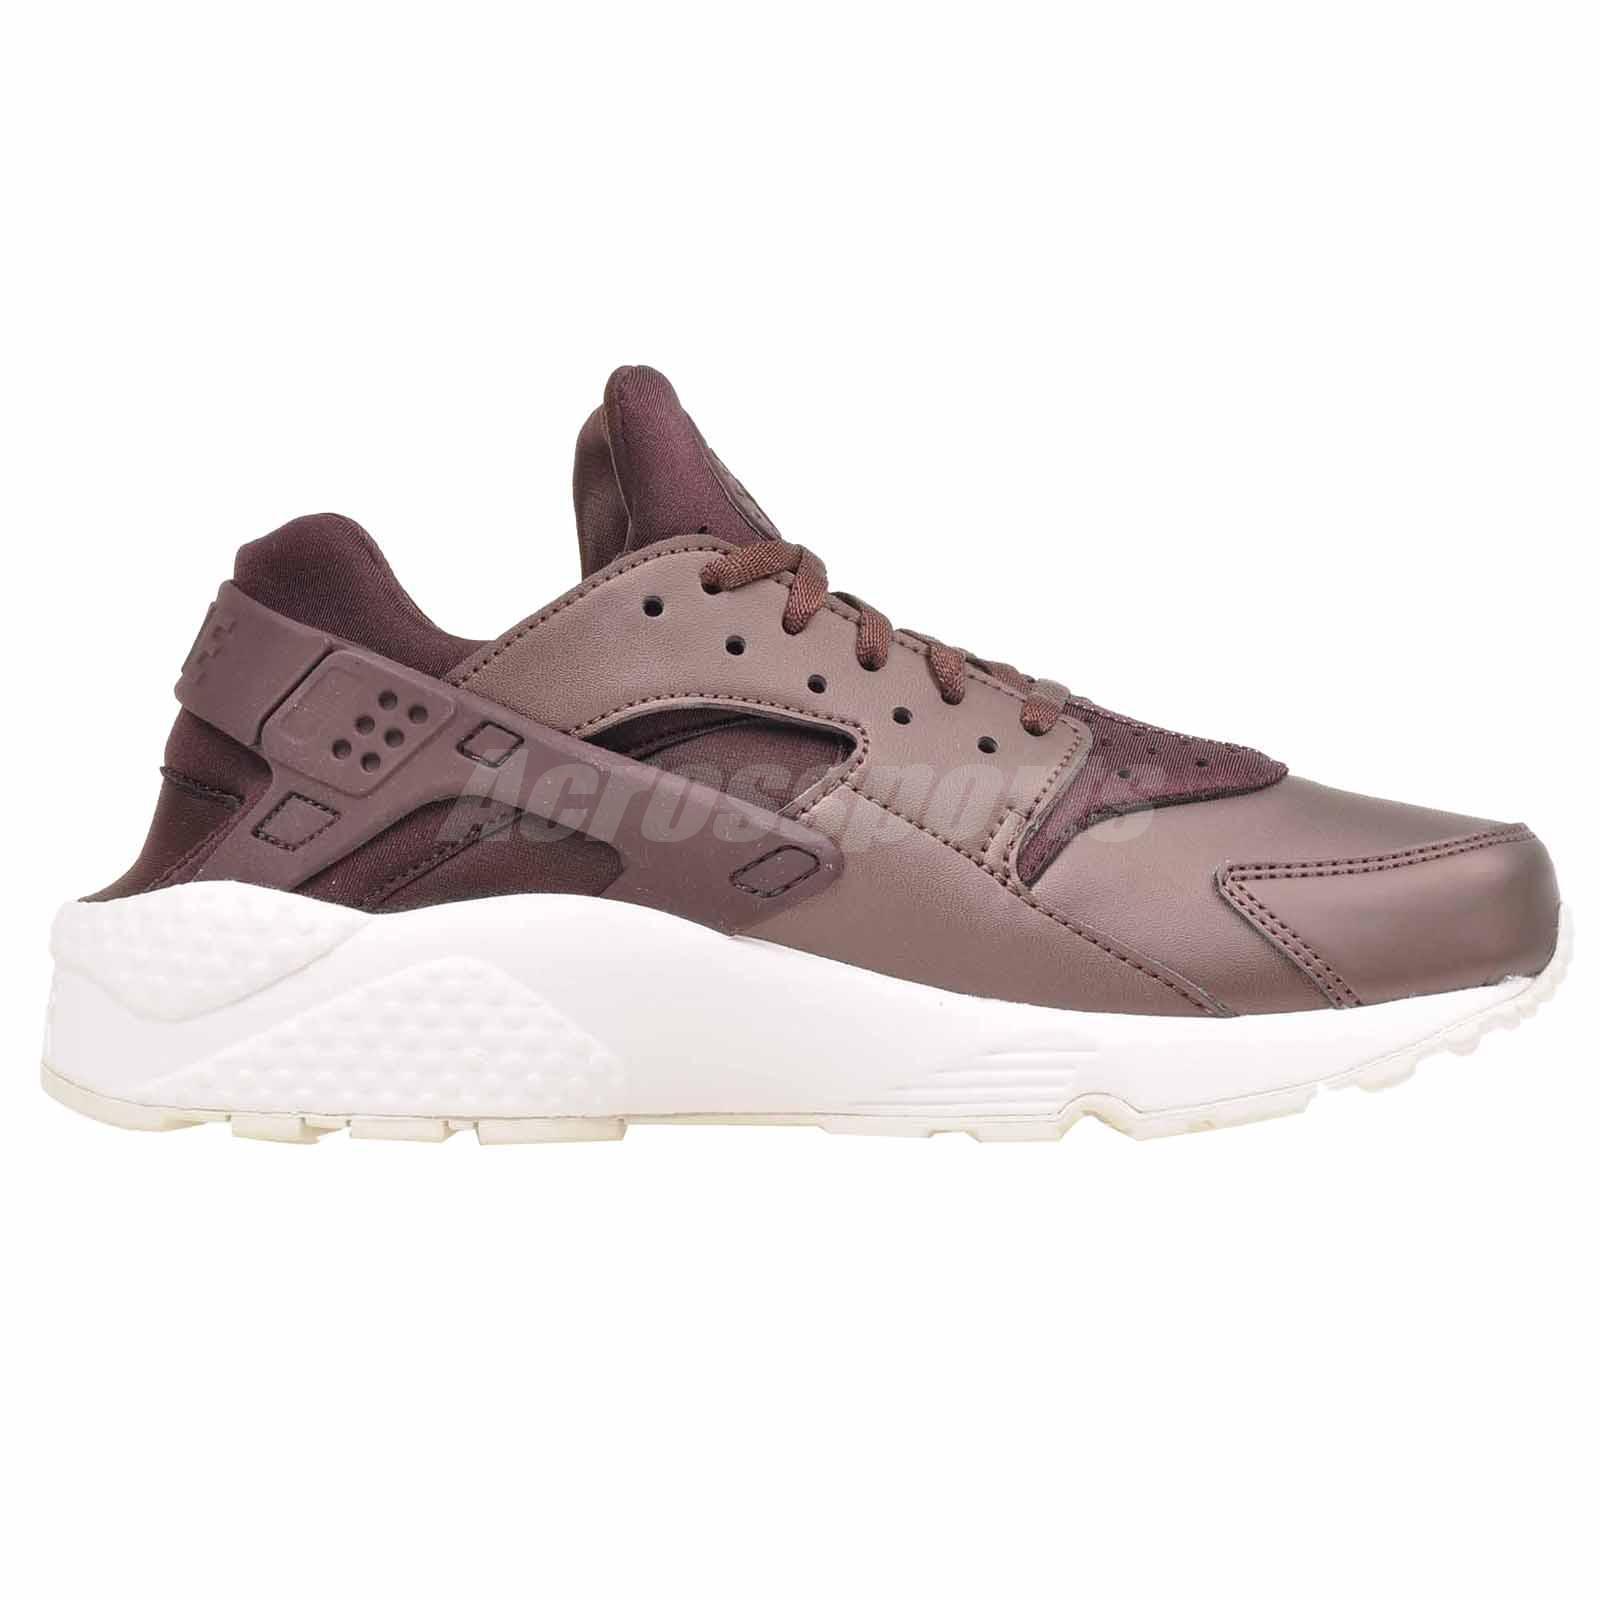 e014c30957209 Nike Wmns Air Huarache Run PRM TXT Running Womens Shoes Mahogany ...